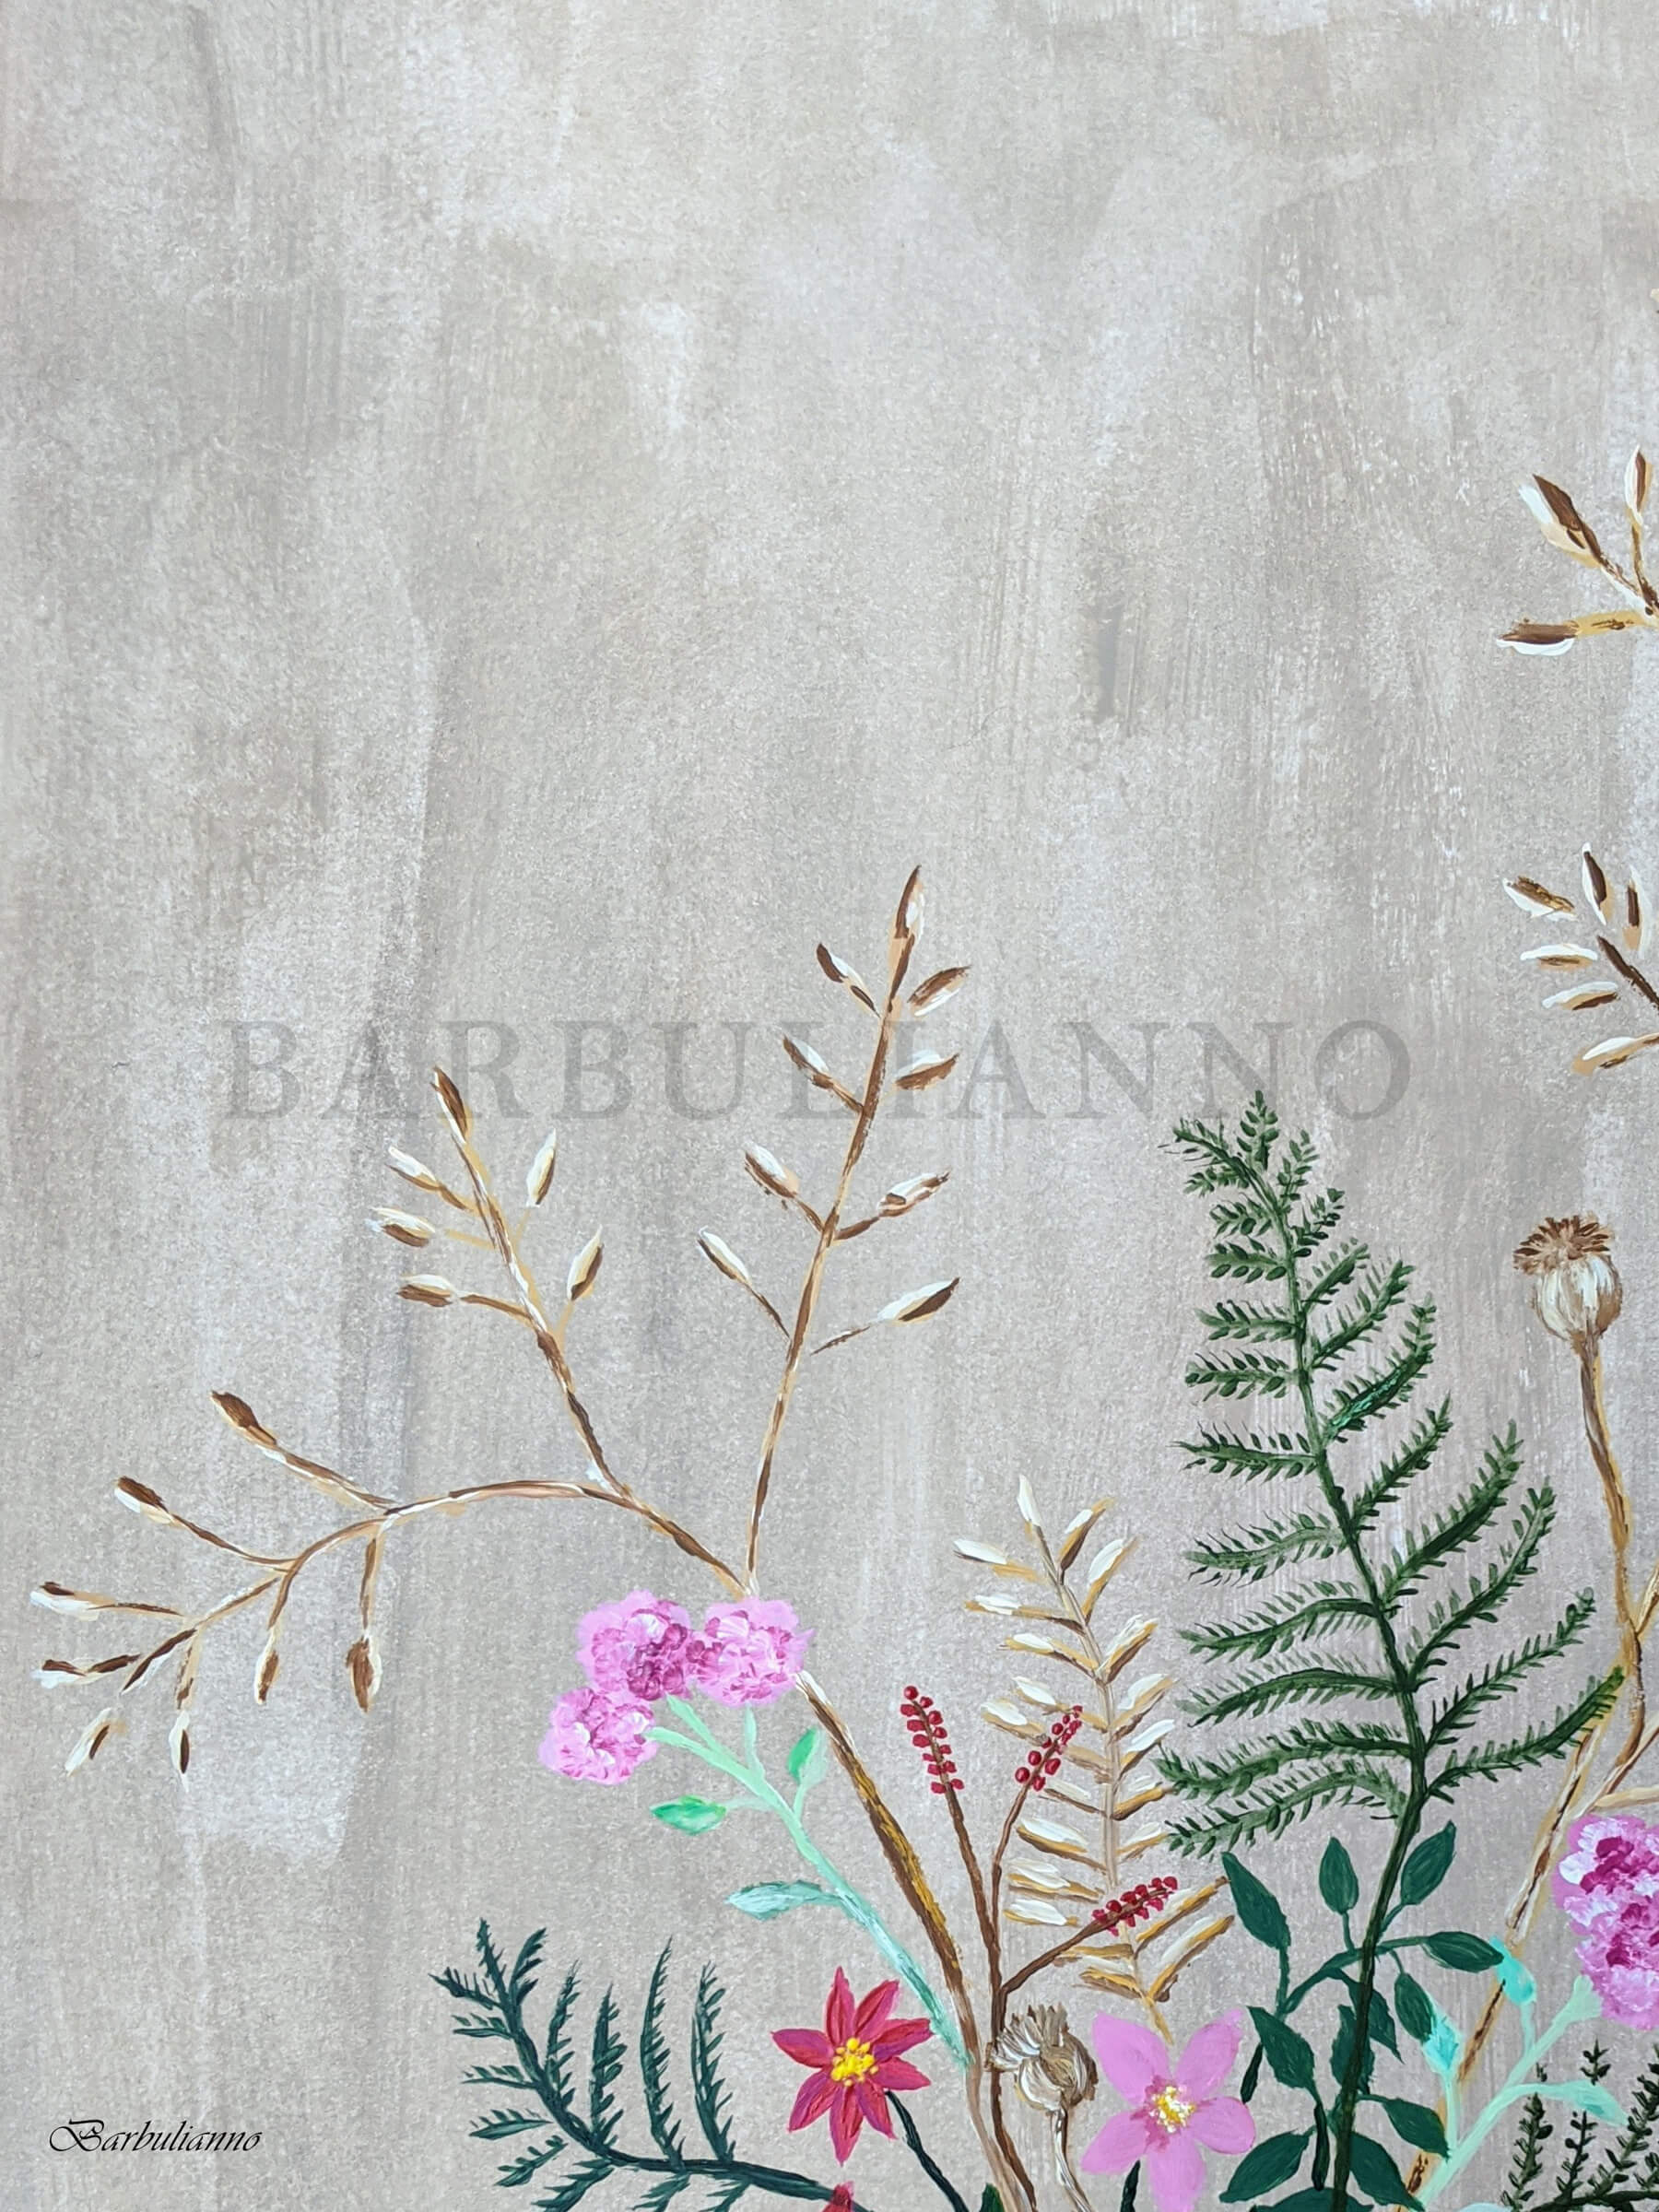 Wildflowers Wall Art _ Barbulianno Design